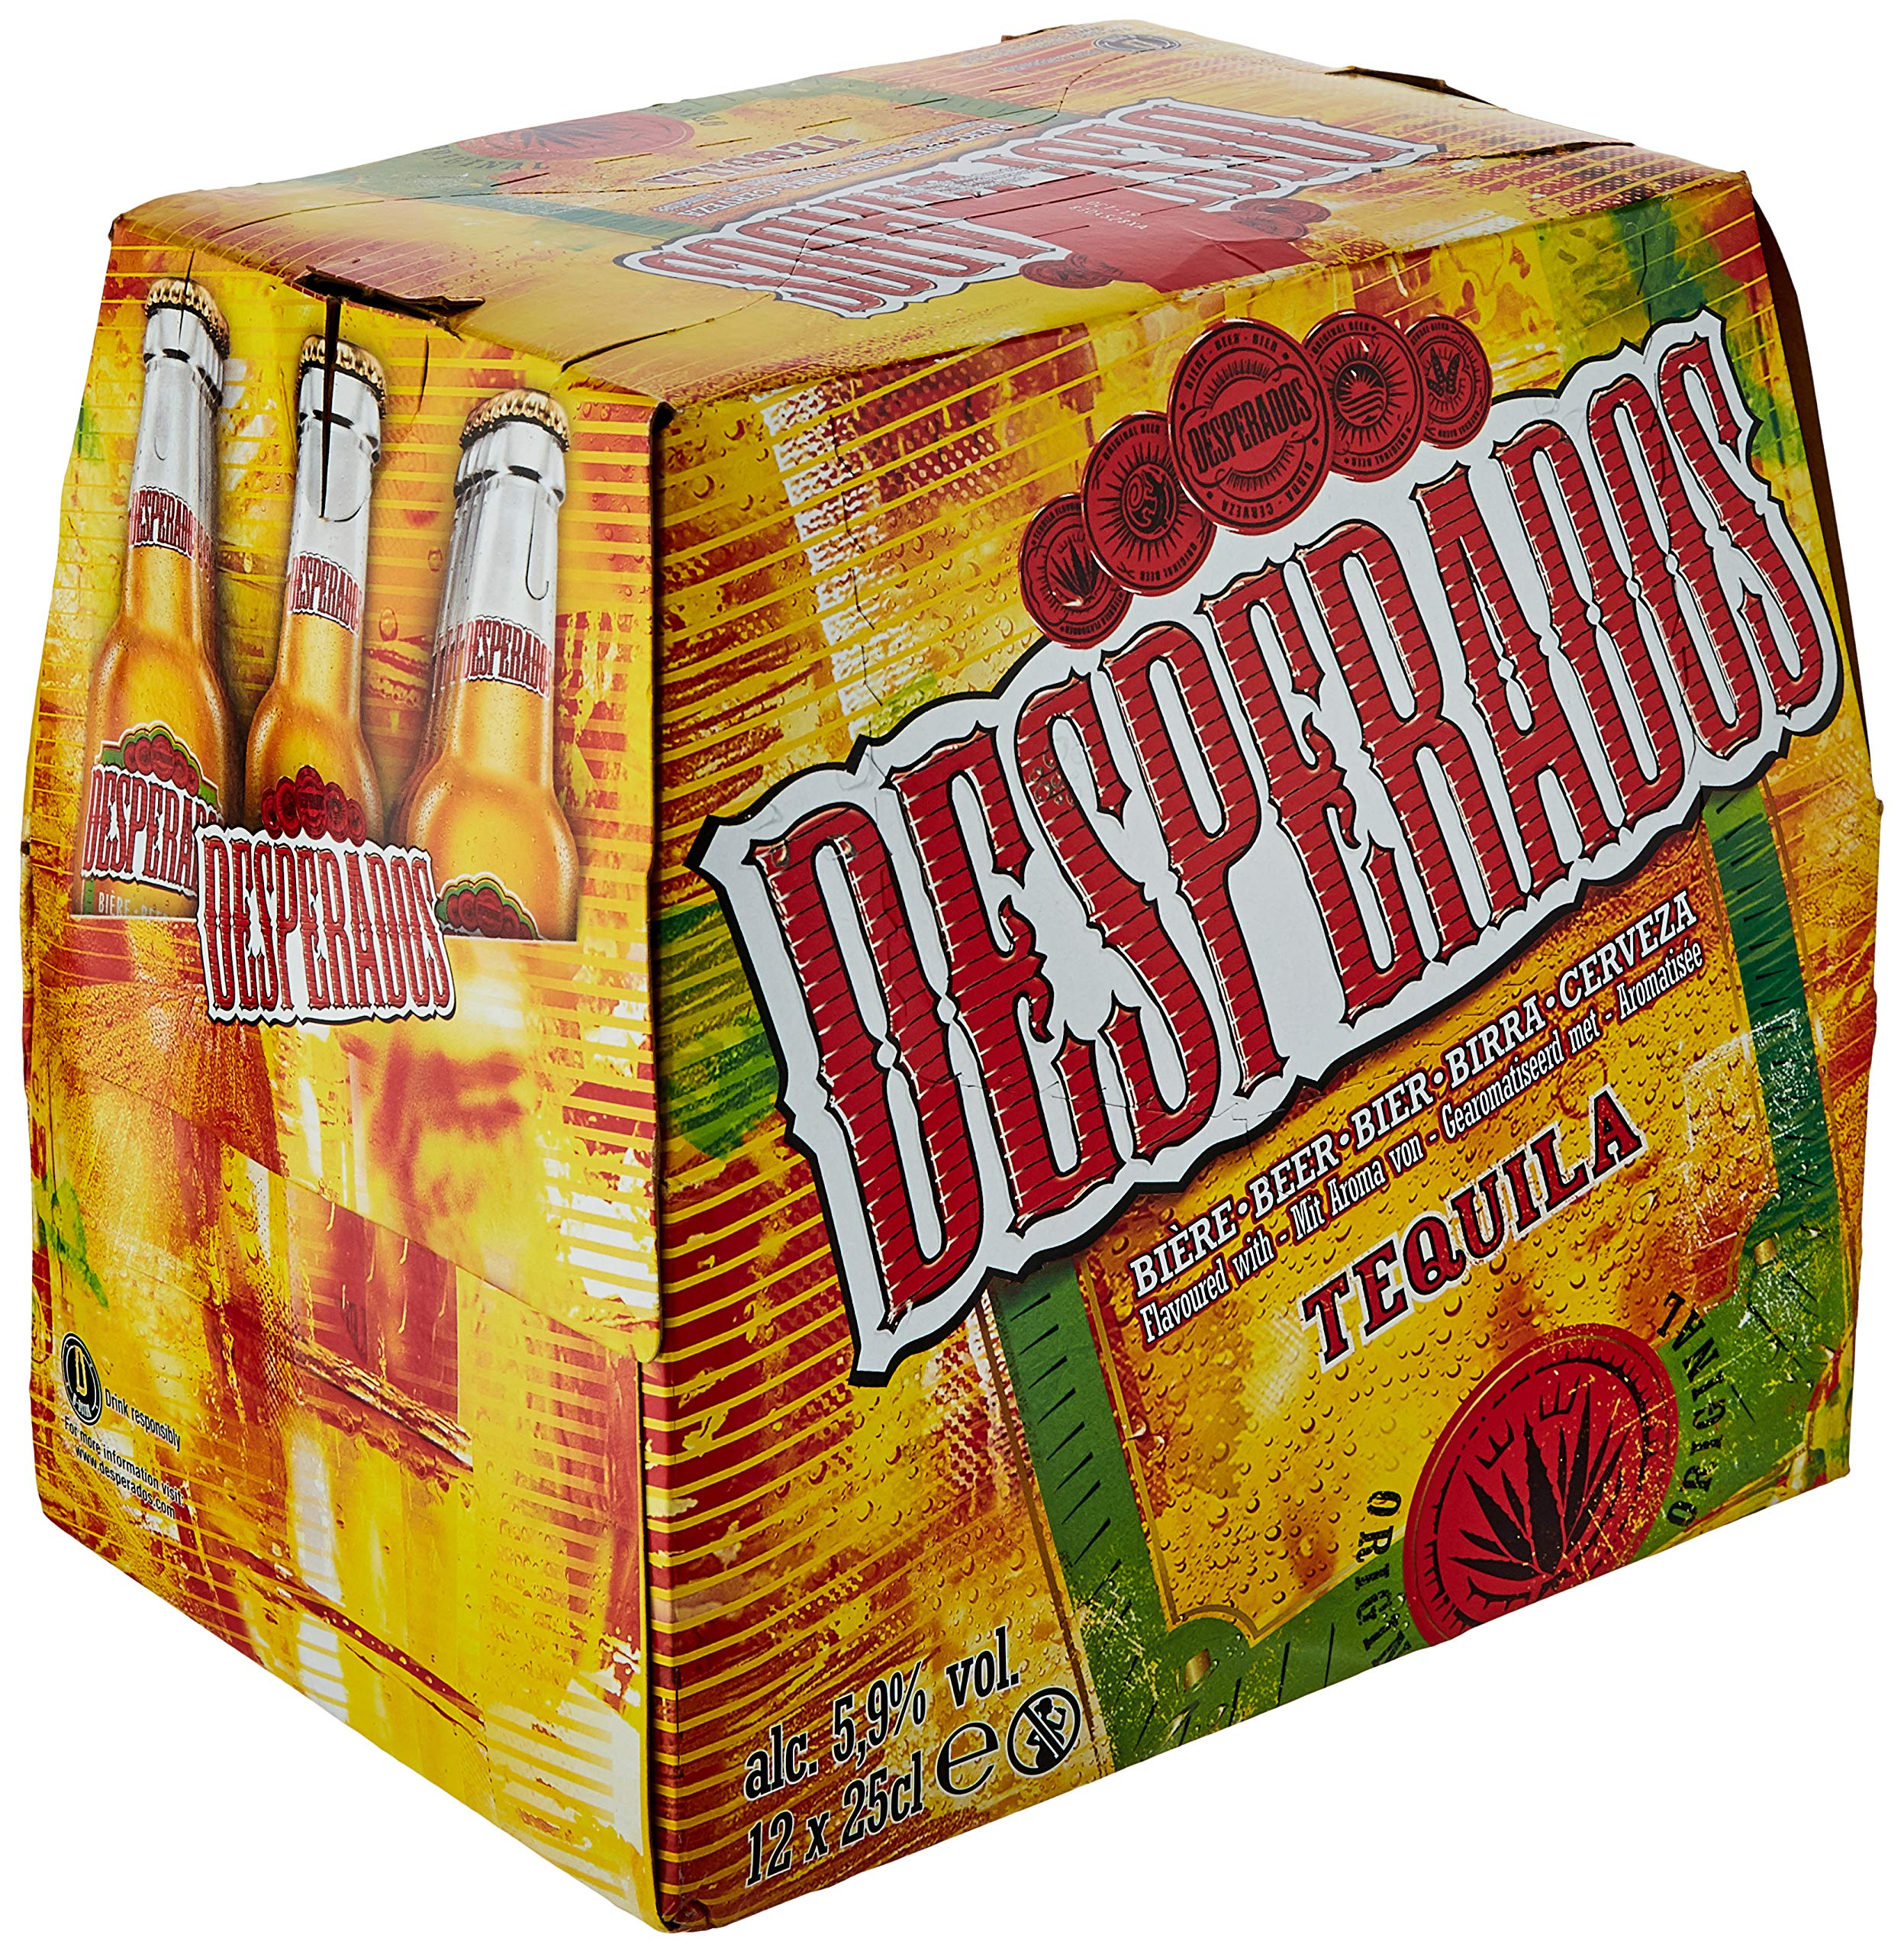 Desperados Beer Bottles 12x250ml Buy Online In Canada At Desertcart